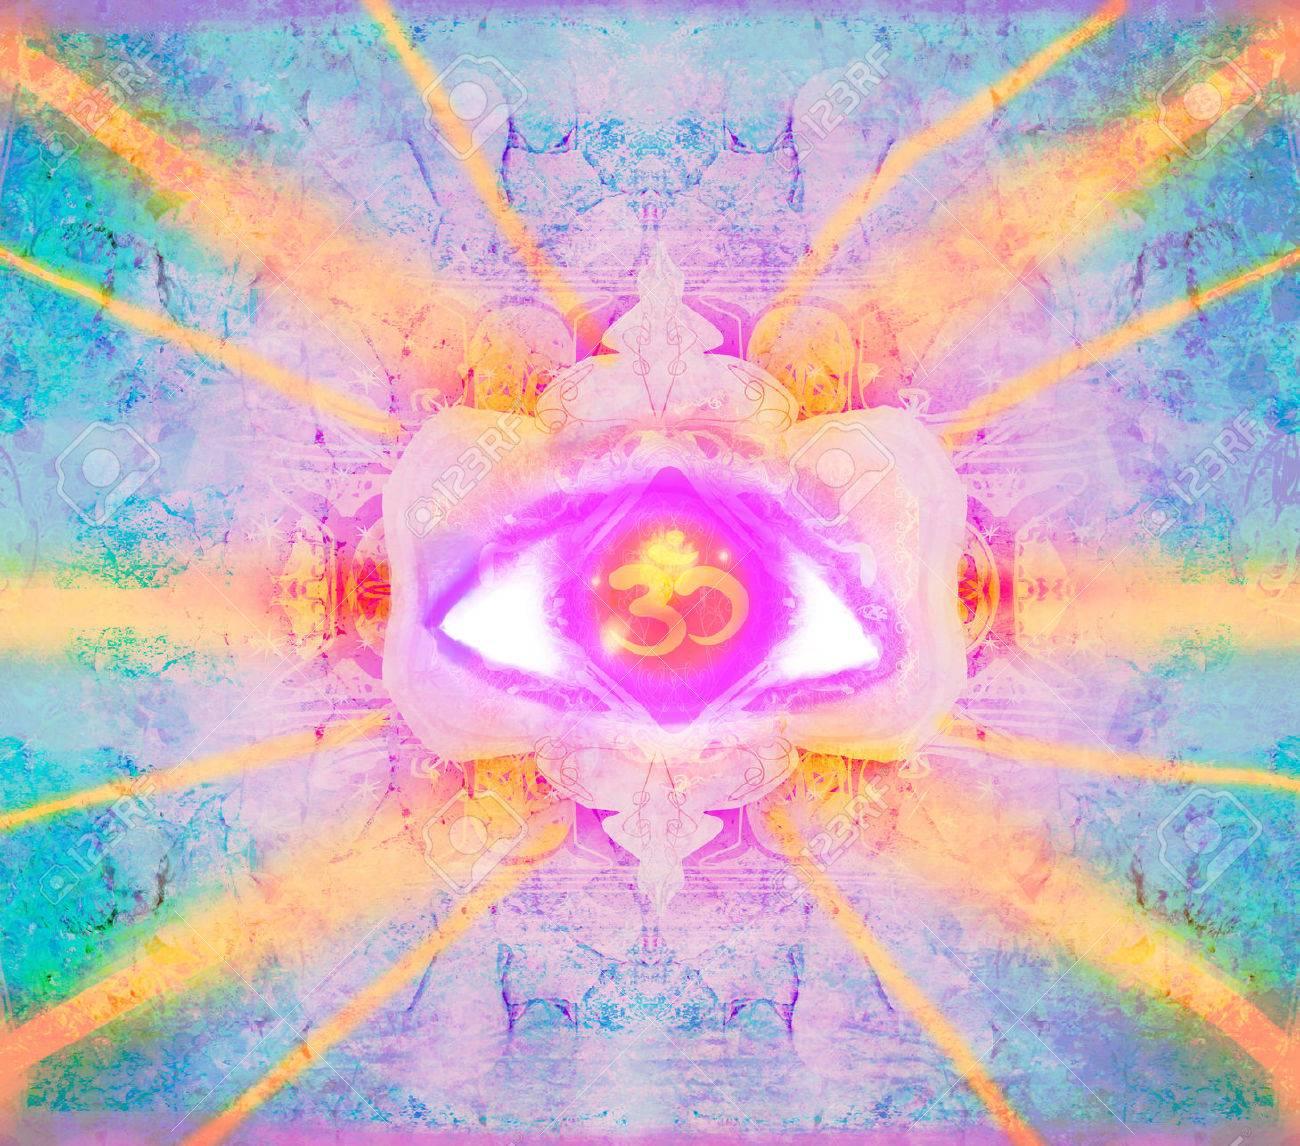 illustration of a third eye mystical sign - 47162211